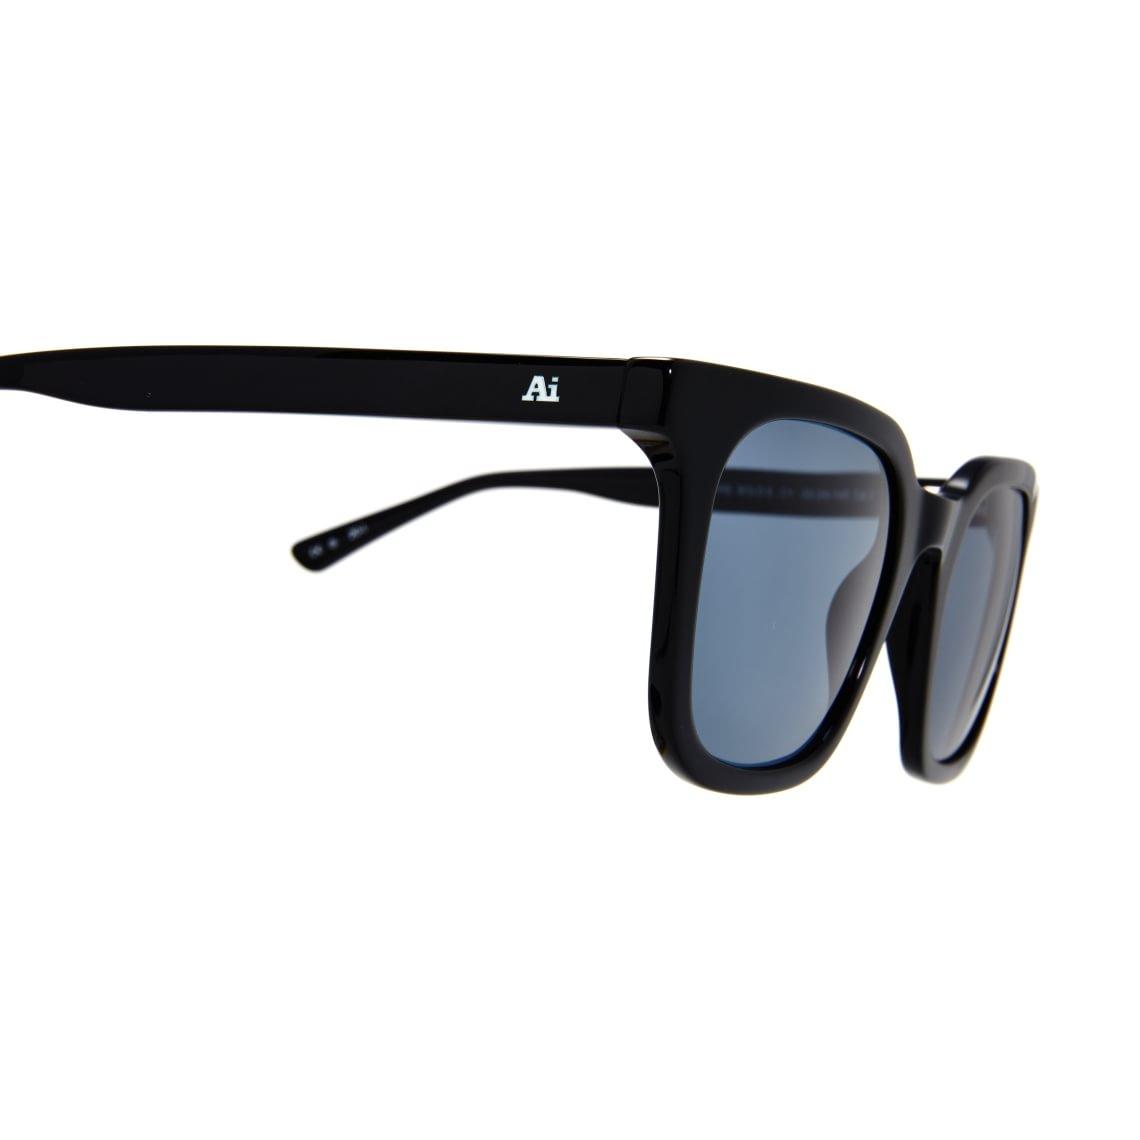 Ai Square Bold S C1 52-24